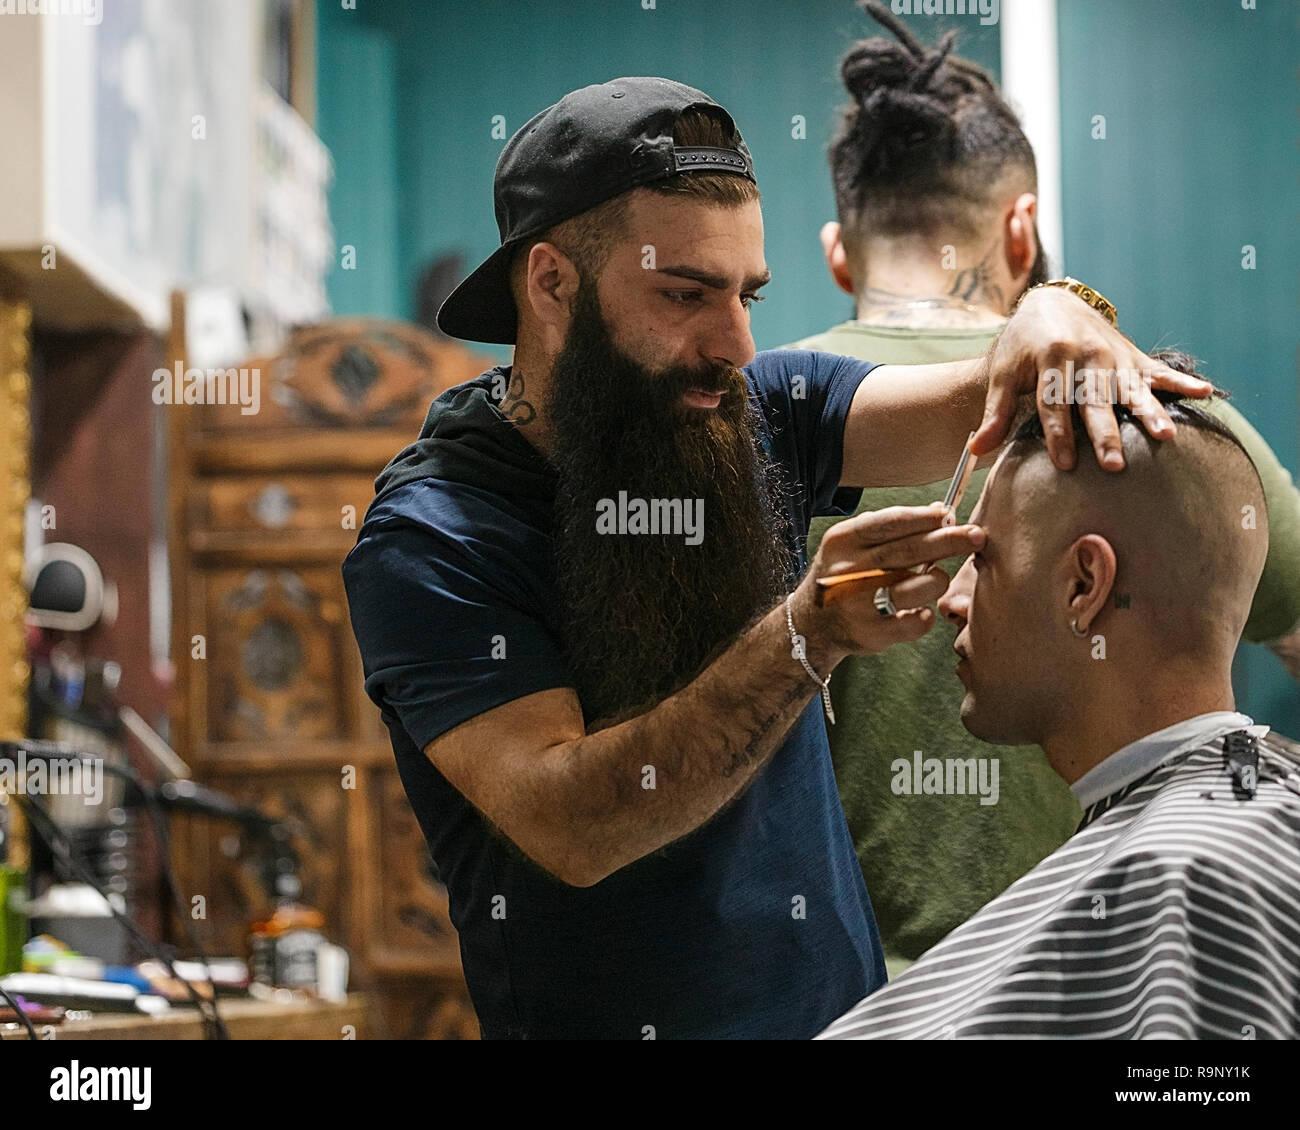 Brisbane, Australia-October 02,2018: Hipster hairdresser serves his client in an Australian barber shop. - Stock Image